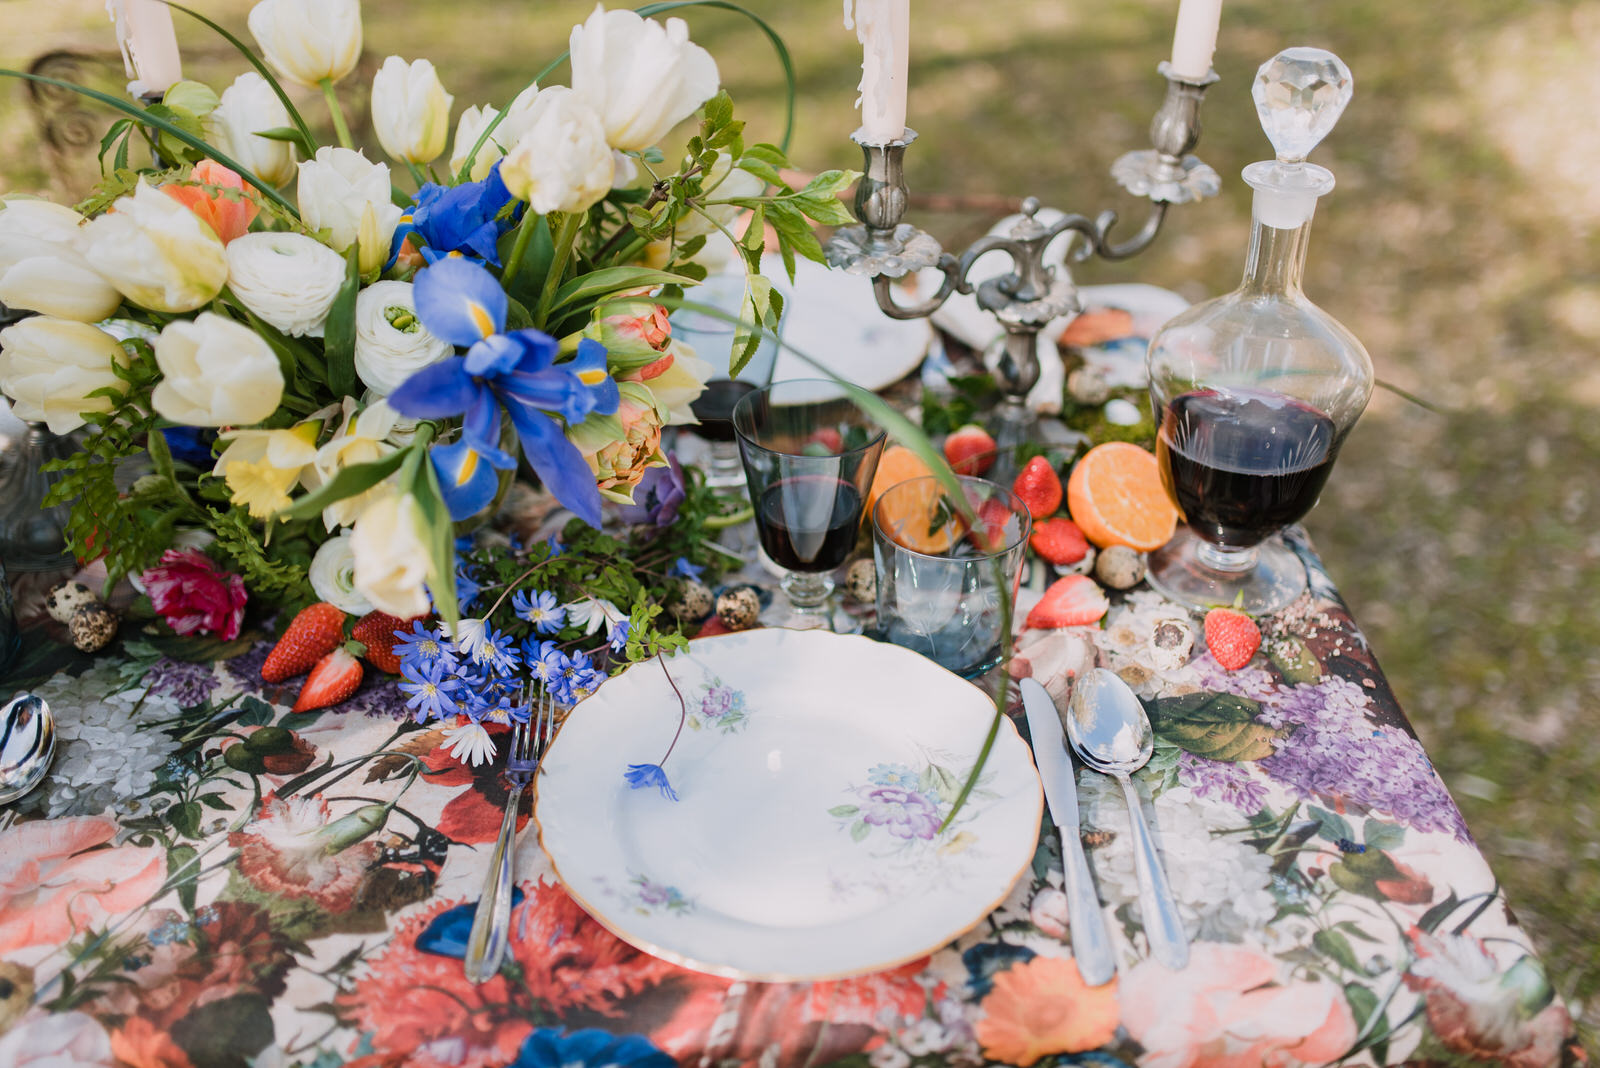 tuscany wedding photography 4.jpg